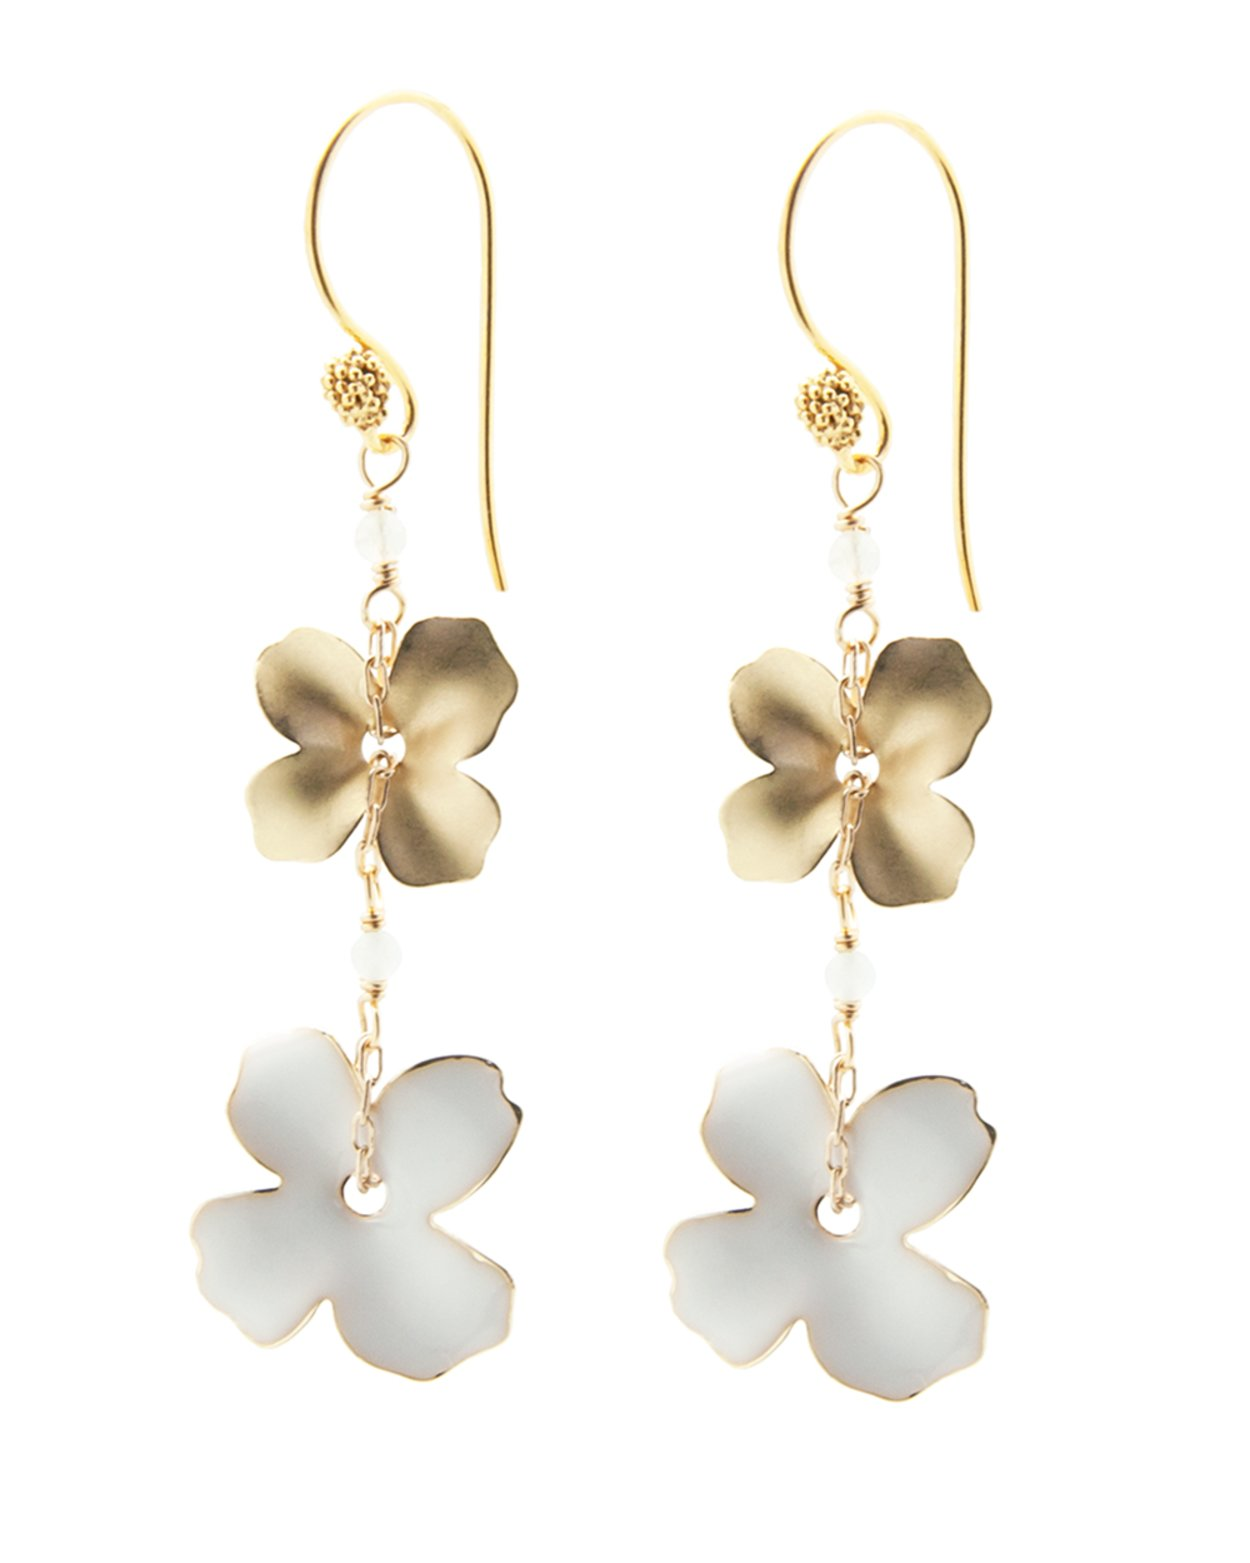 Double Flower Earrings - White